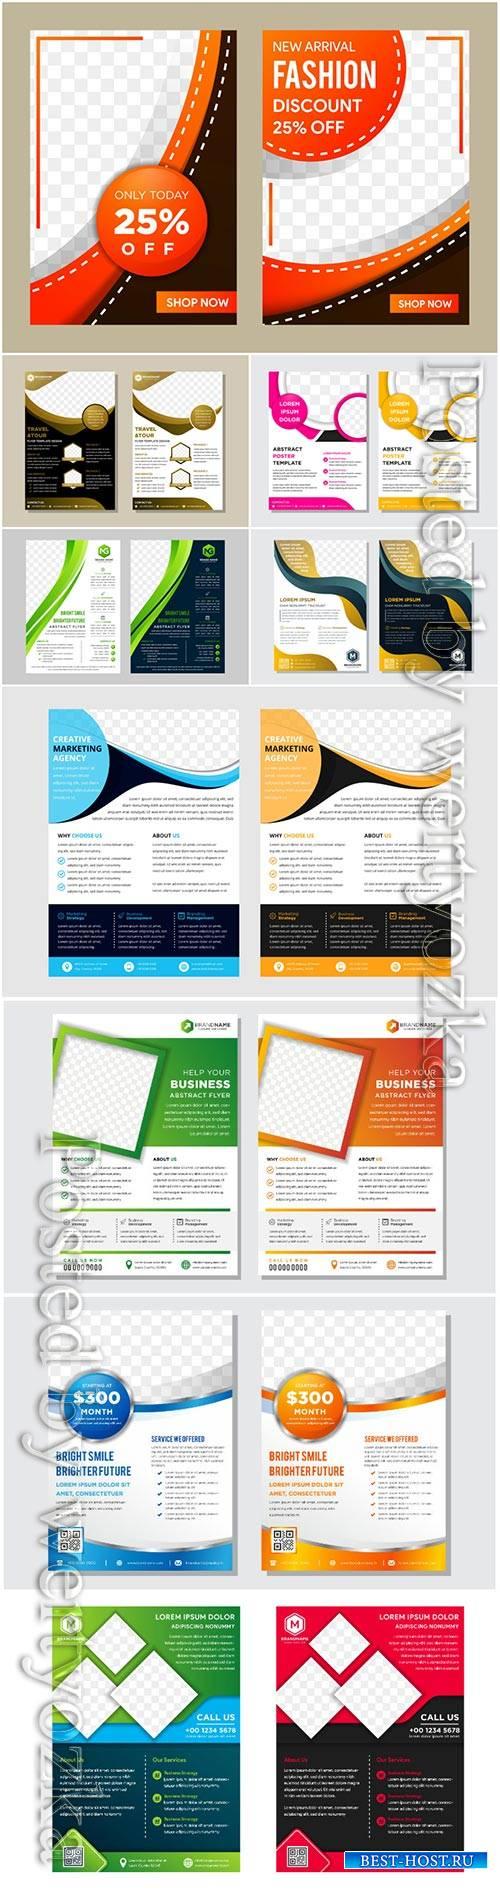 Design vector template for brochure, flyer, magazine